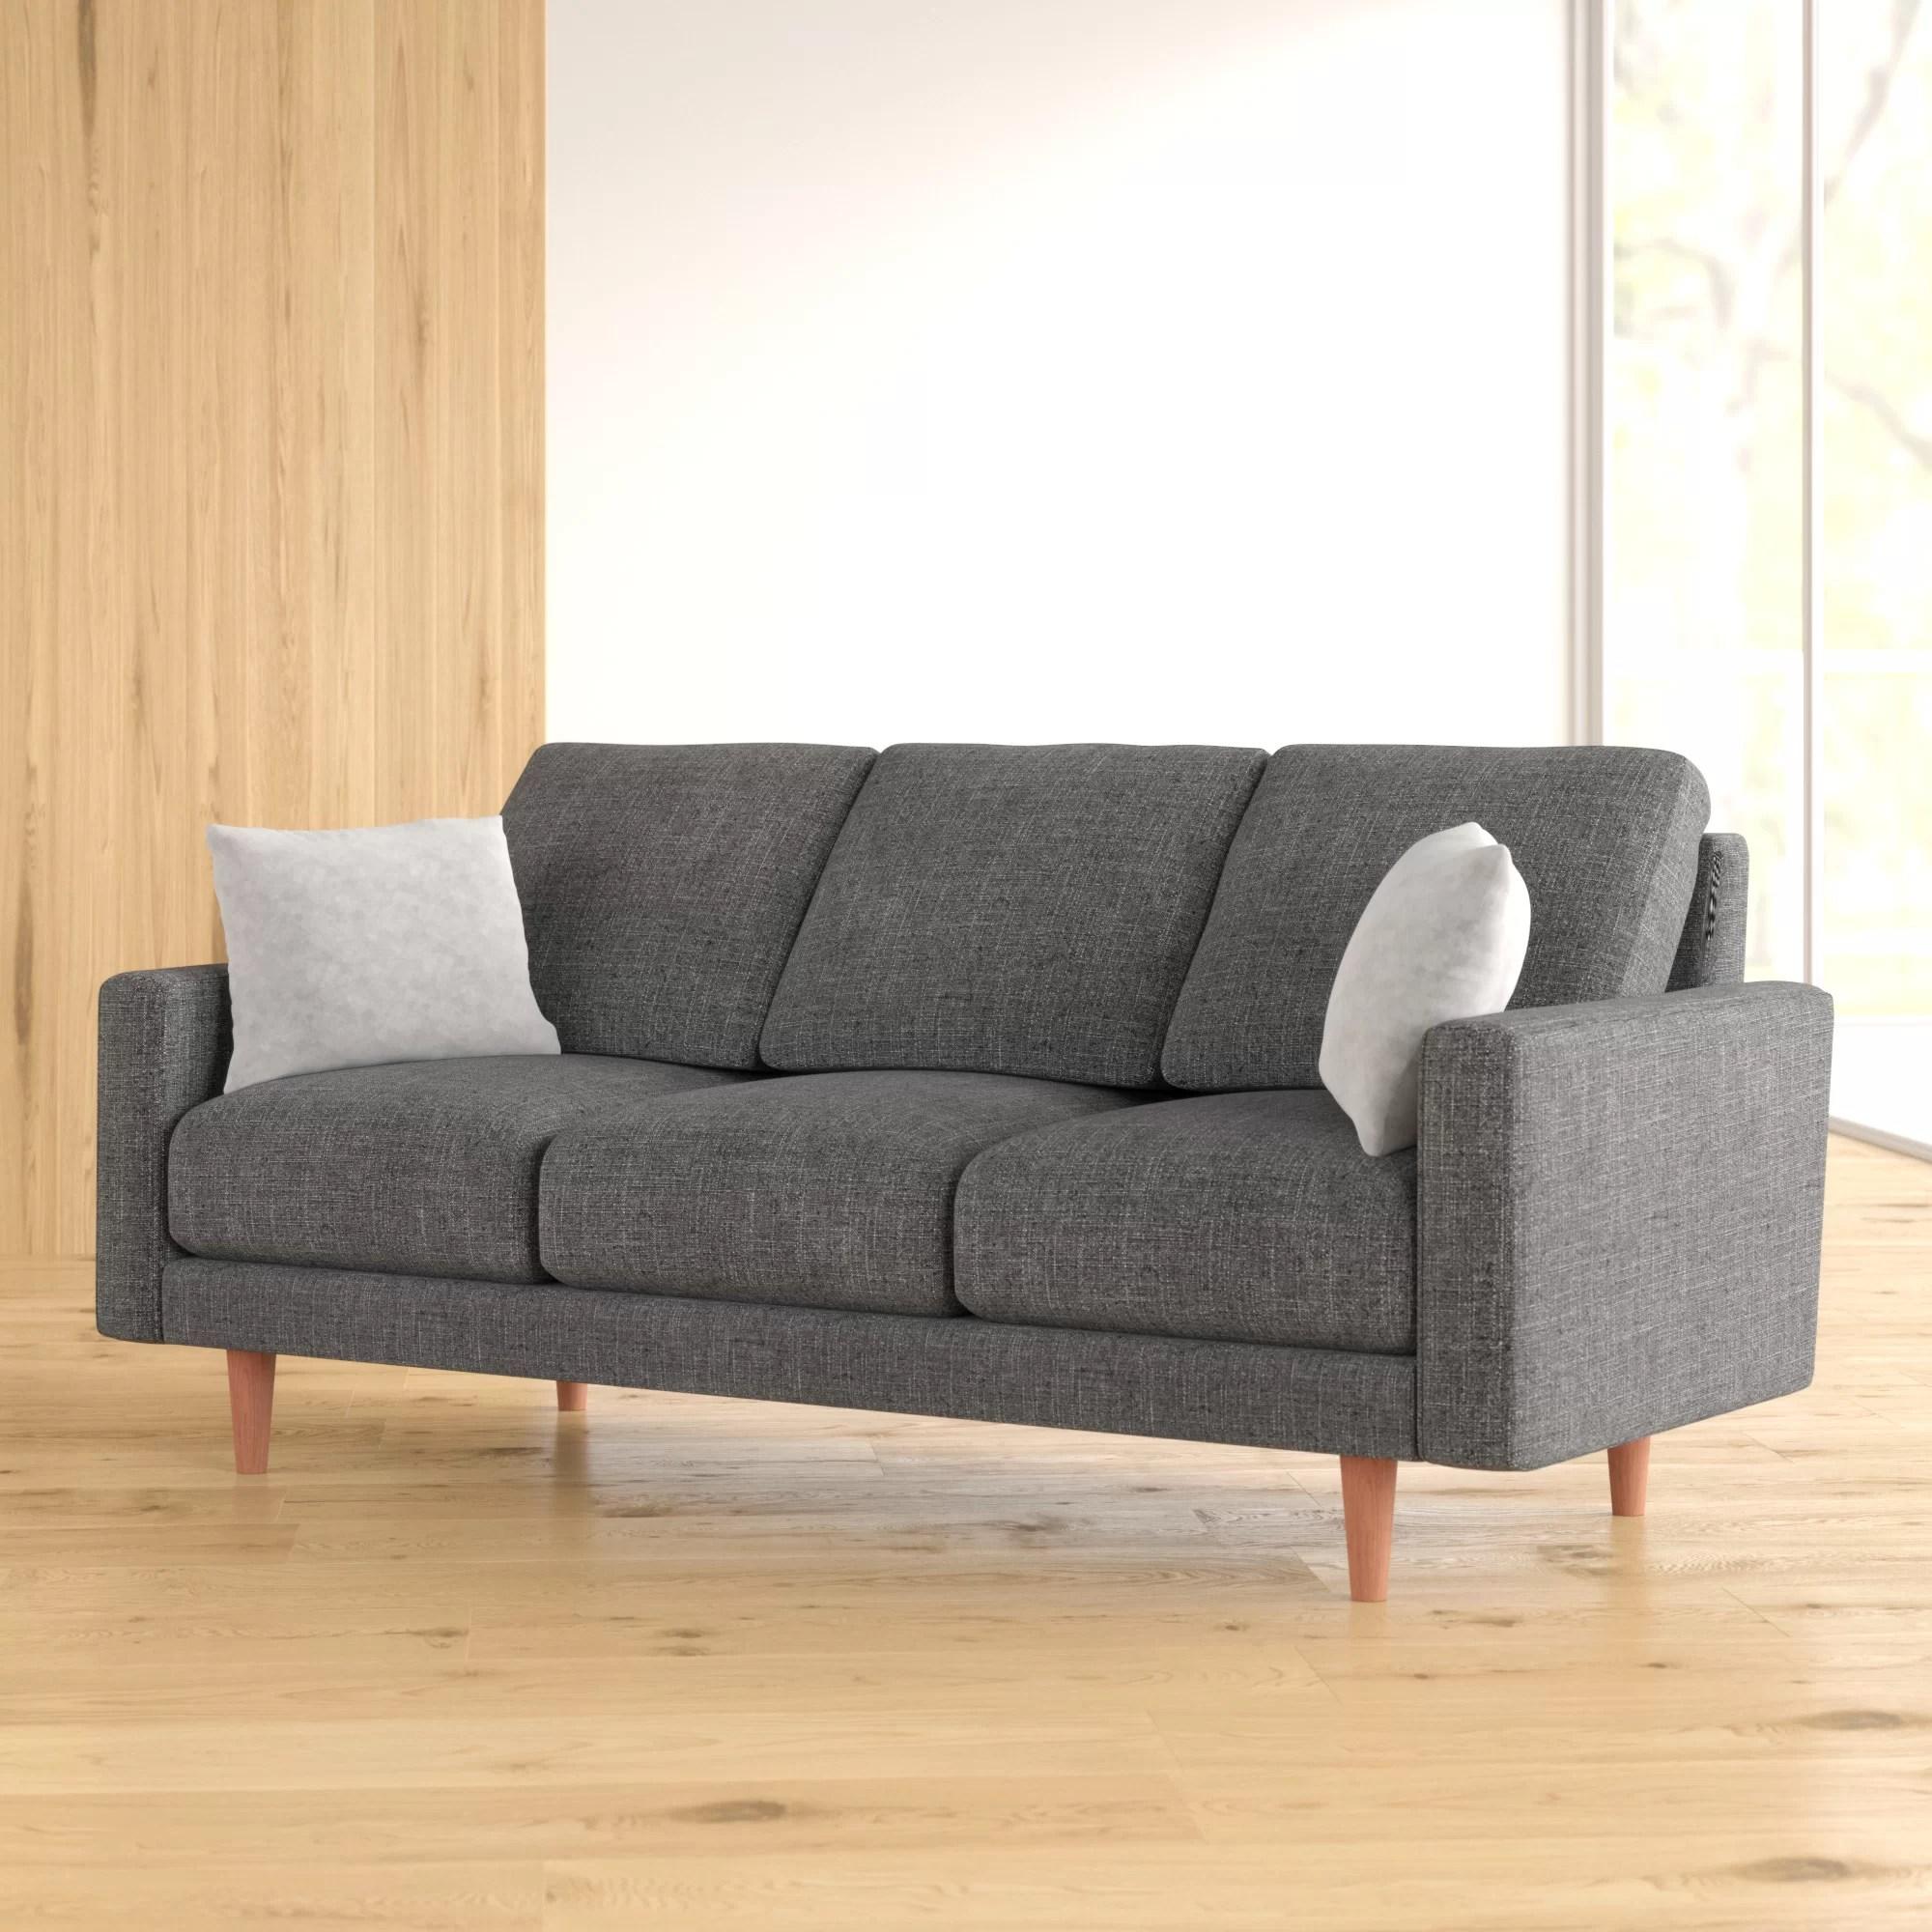 Furniture Armrest Covers Buy Living Room Furniture Khaki ...